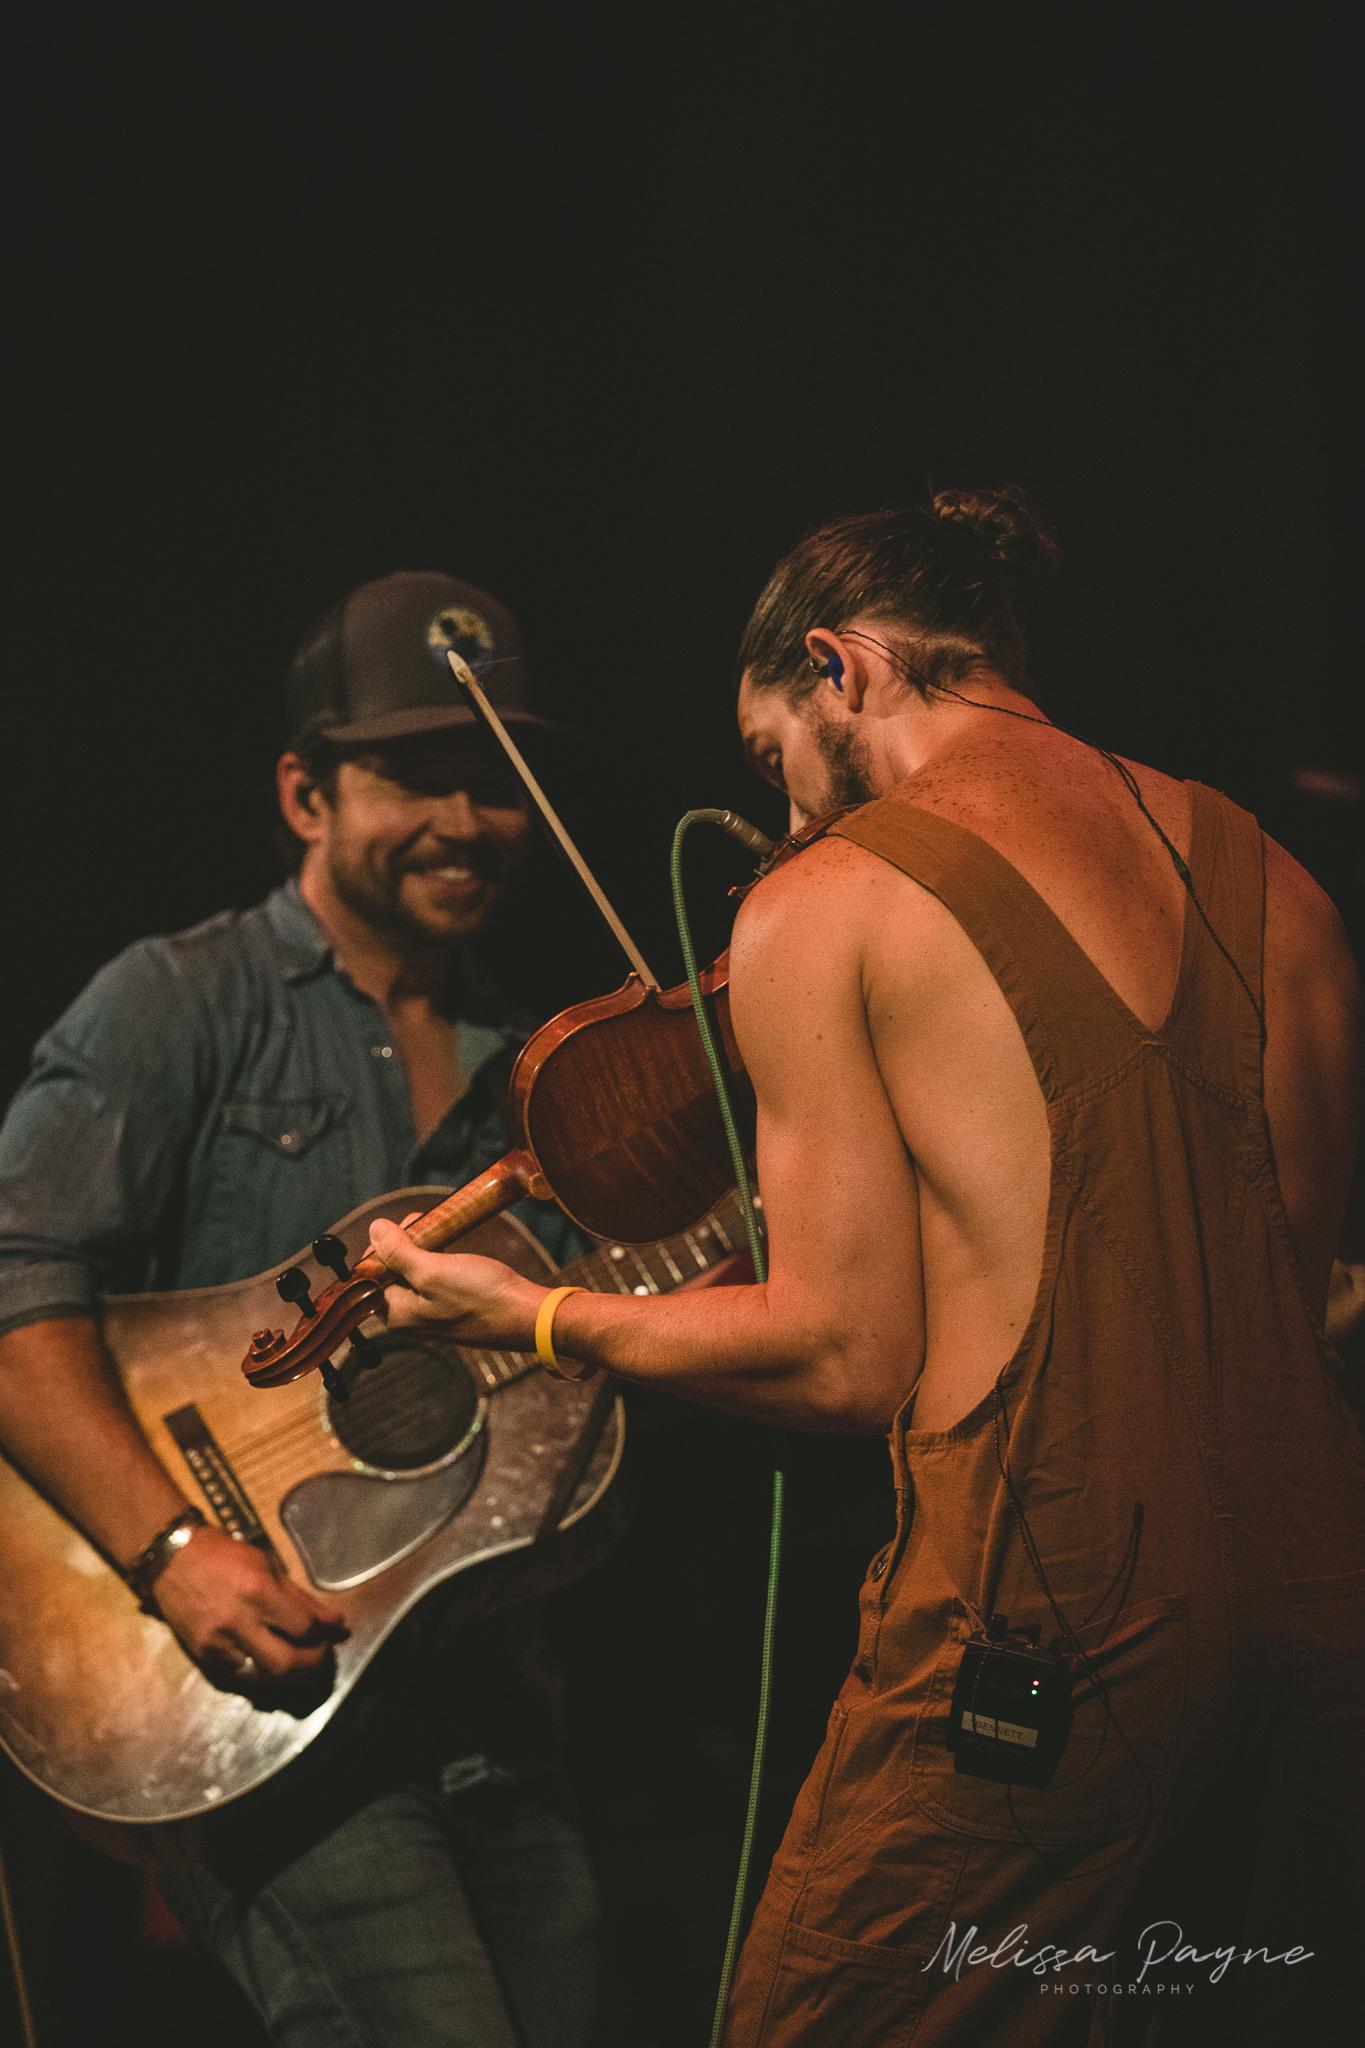 Shane Smith & The Saints | The Oklahoma Reviews